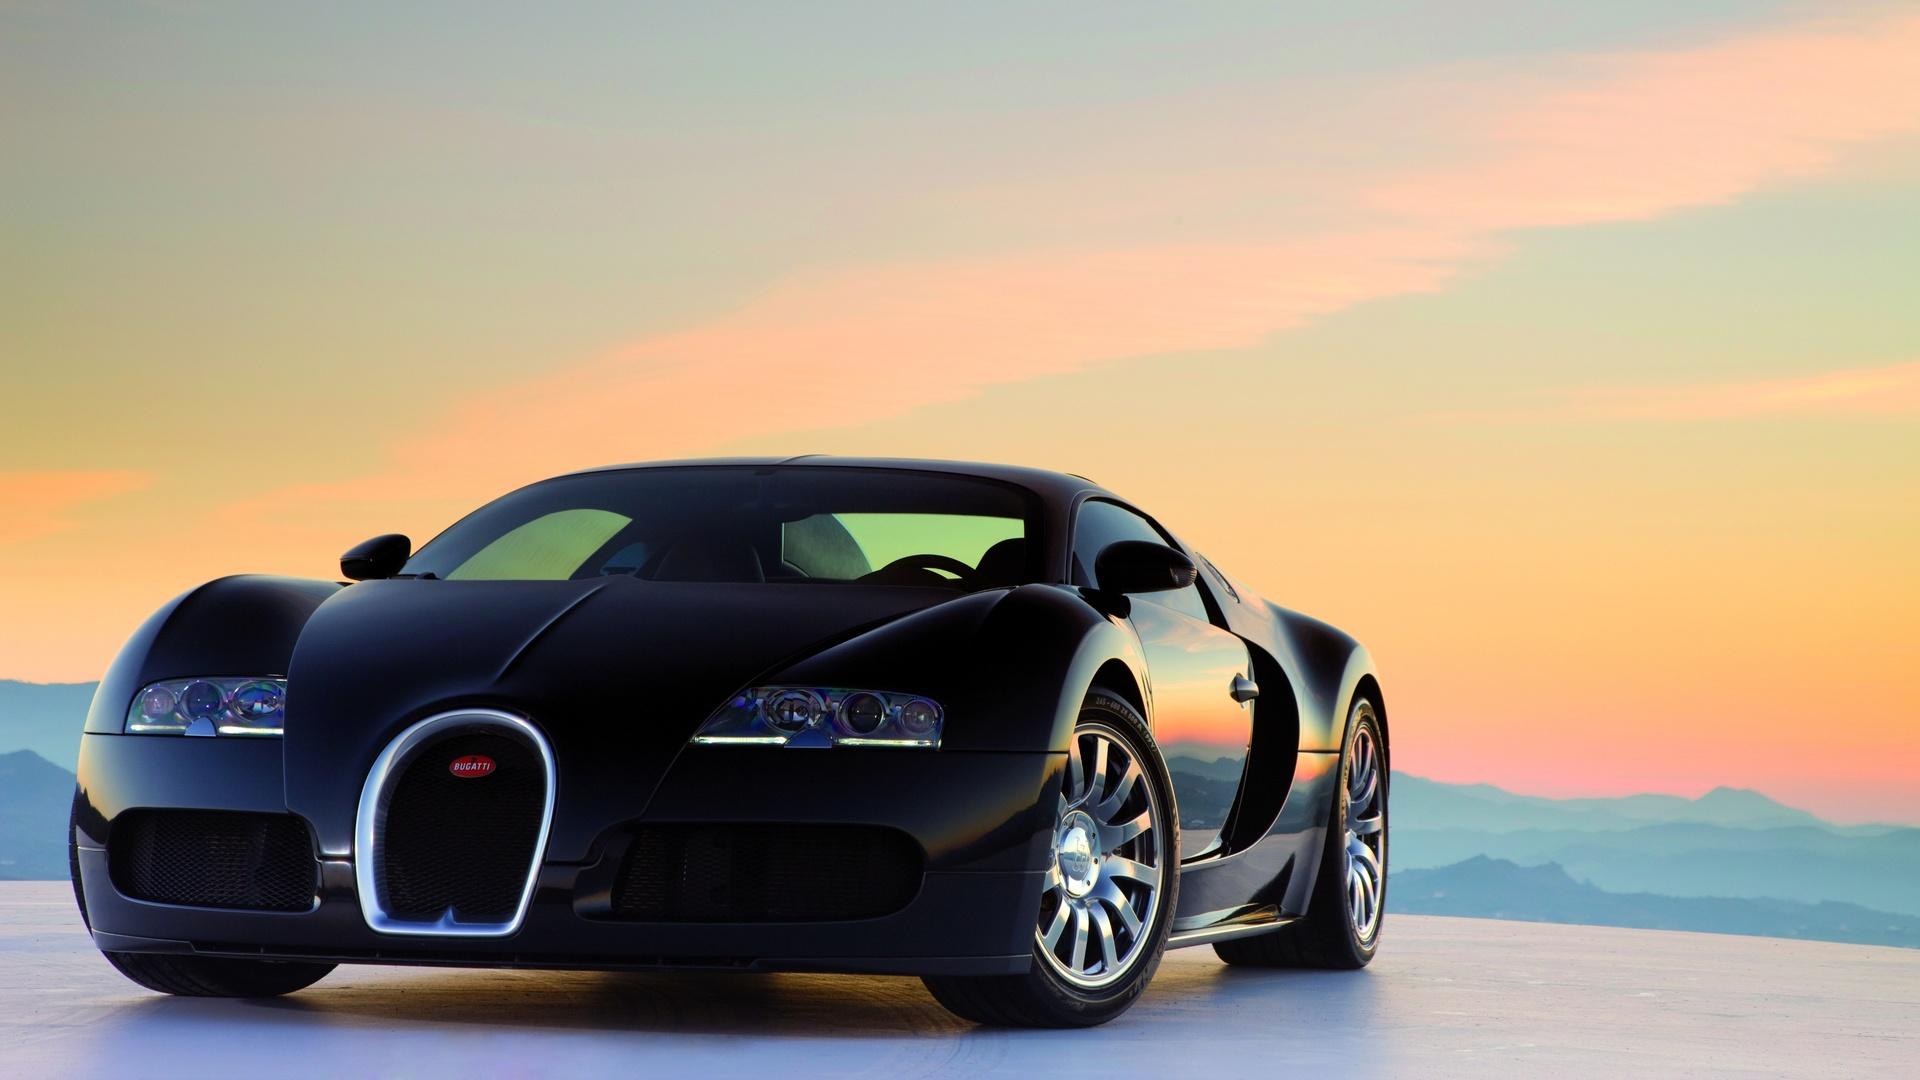 bugatti veyron wallpaper 1080p wallpapersafari. Black Bedroom Furniture Sets. Home Design Ideas